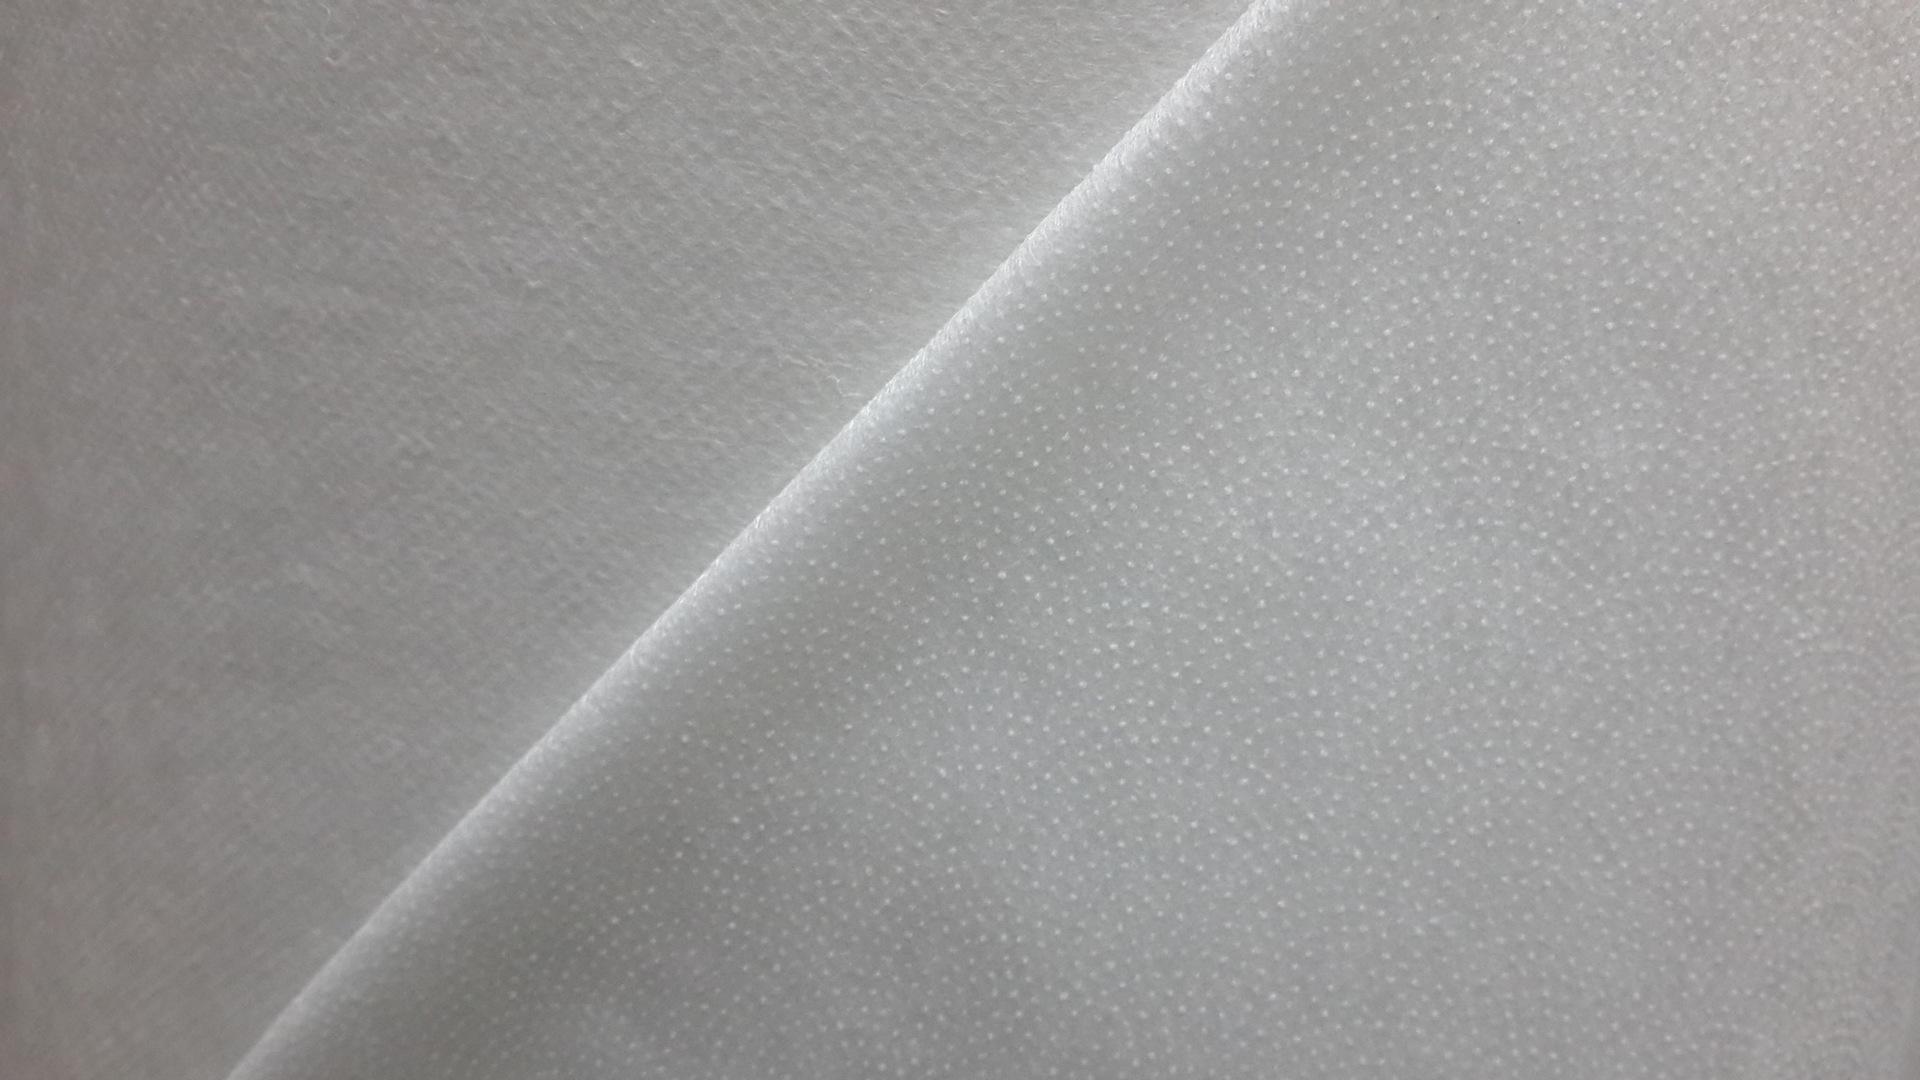 Vải lót Long sleeve medium-sized high-quality cotton lining nonwoven lining